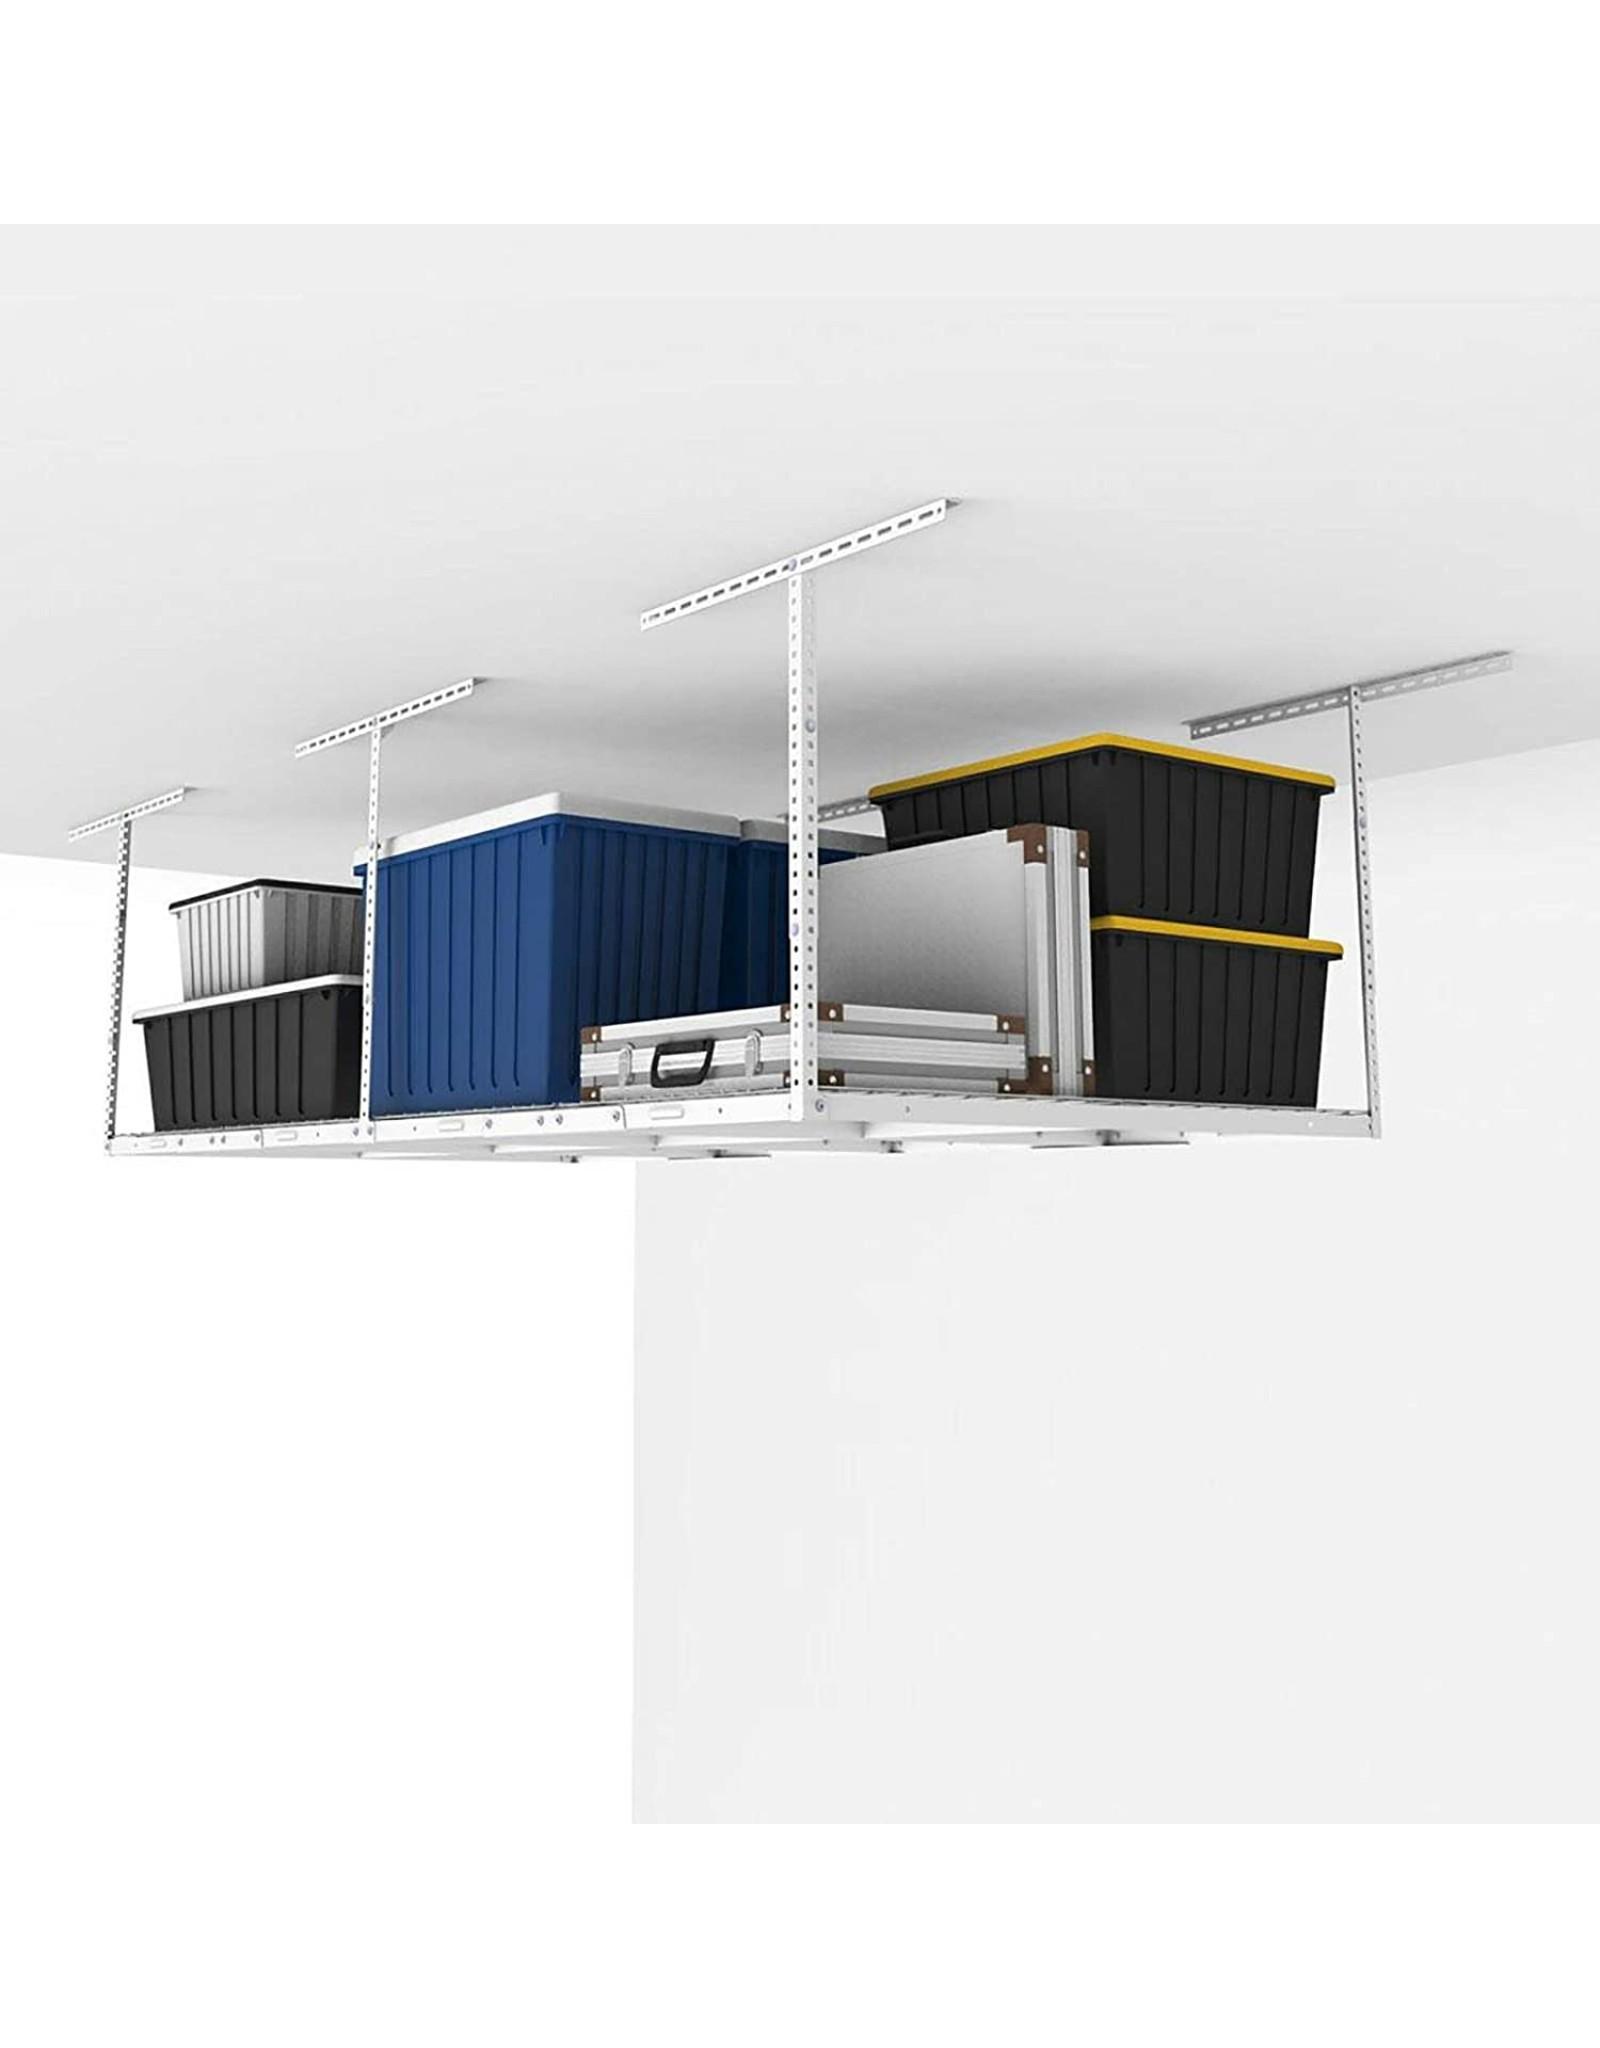 "FLEXIMOUNTS FLEXIMOUNTS 4x8 Overhead Garage Storage Rack Adjustable Ceiling Storage Rack Heavy Duty, 96"" Length x 48"" Width x (22.5''-40"" Ceiling Dropdown), White"